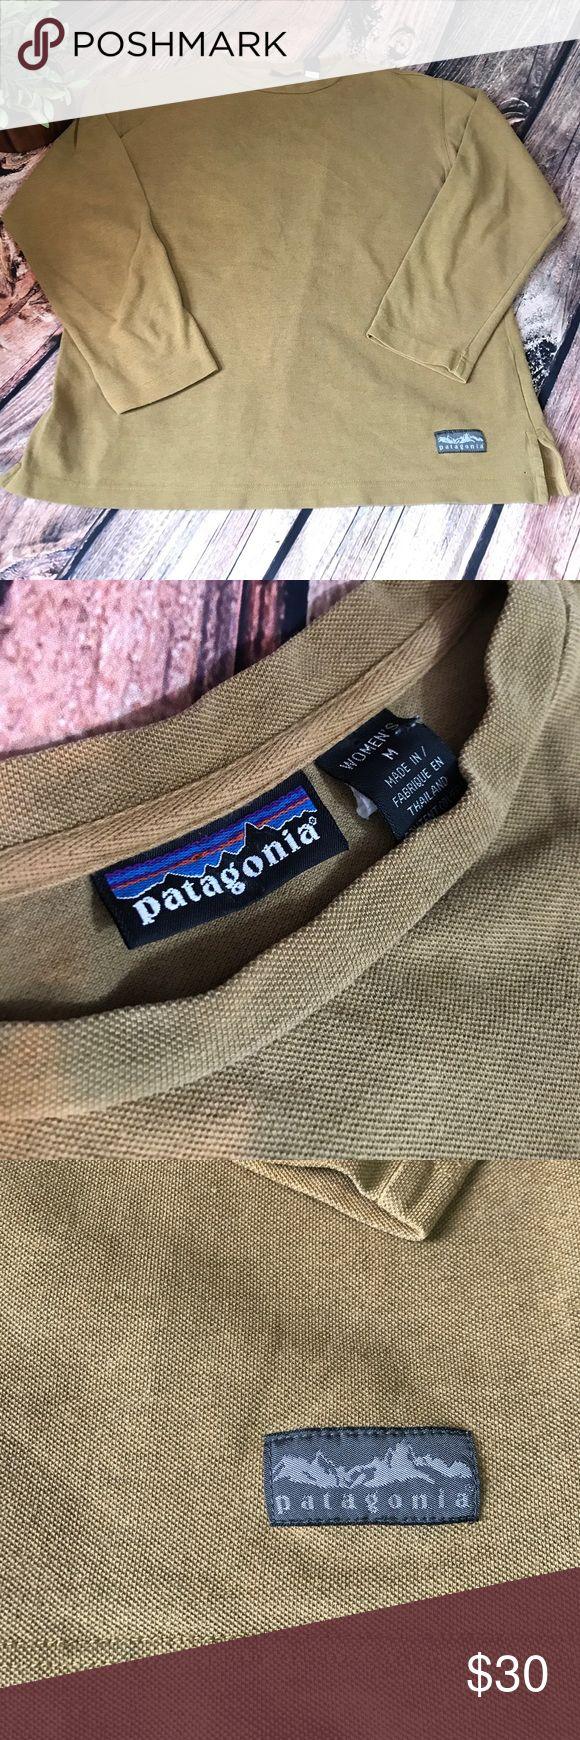 Women's long sleeve Patagonia shirt Long sleeve tan/brown Patagonia shirt.  80% cotton, 10% Raylon, 10% Polyester Patagonia Tops